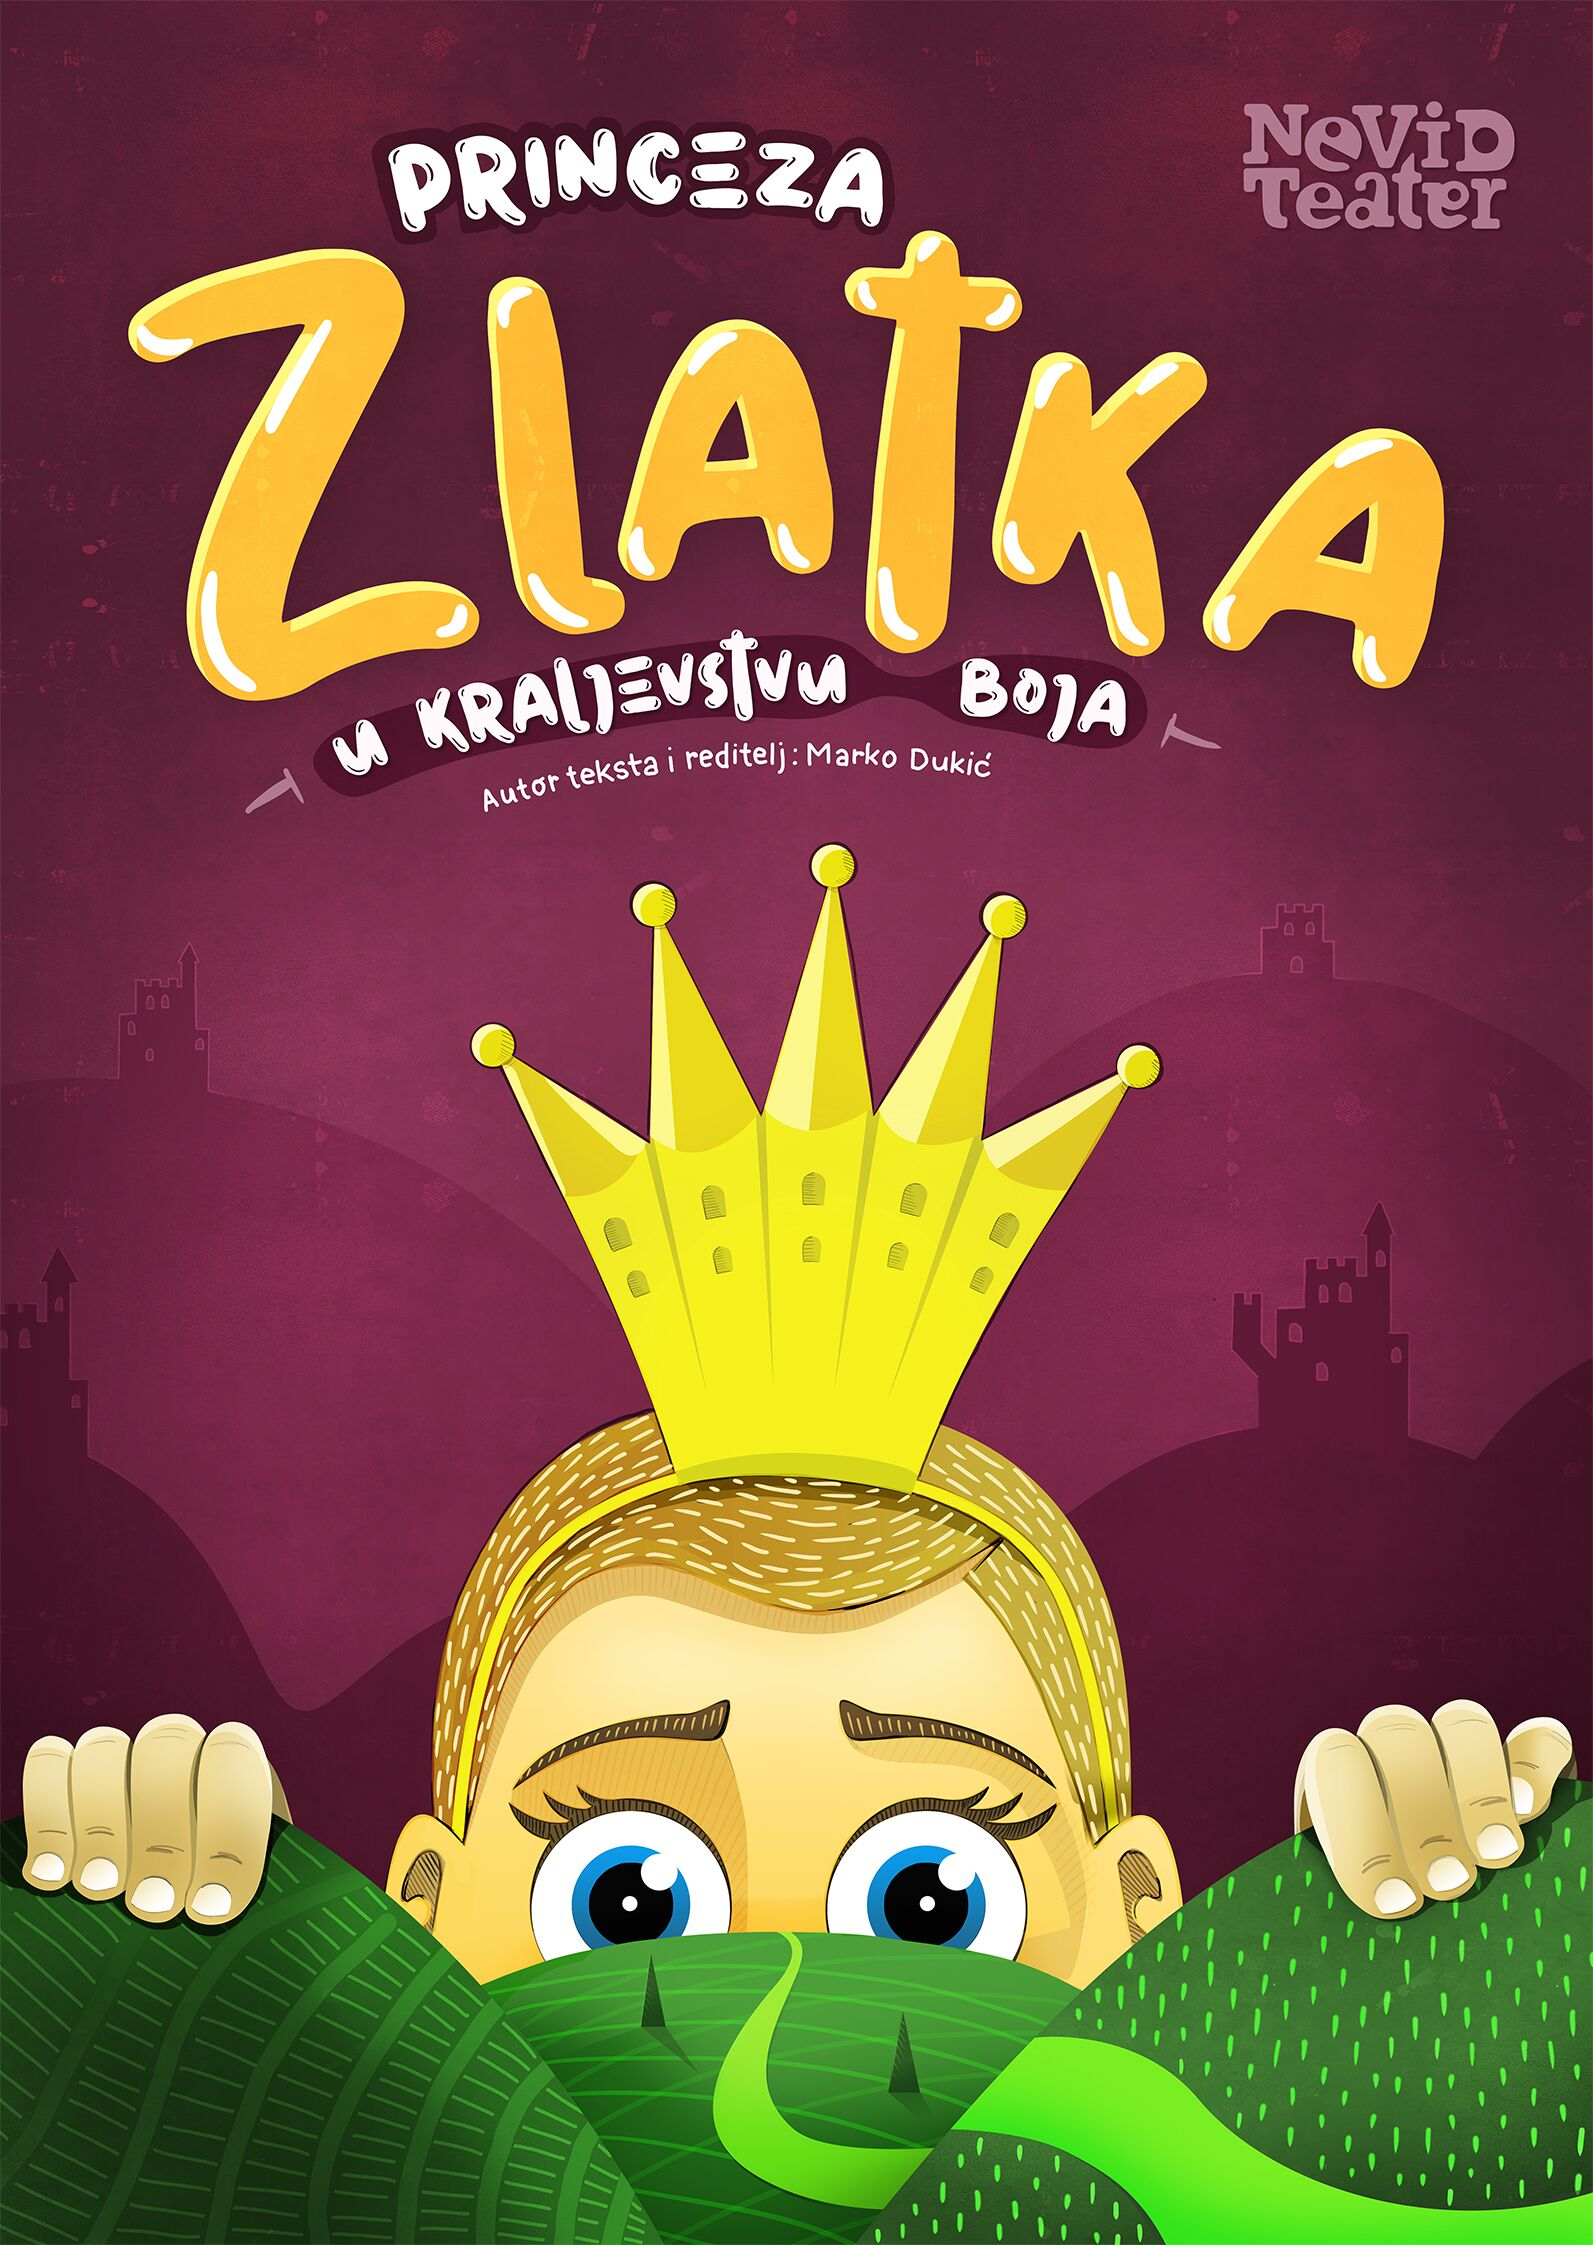 Plakat-Princeza-Zlatka-Nevid-teatar